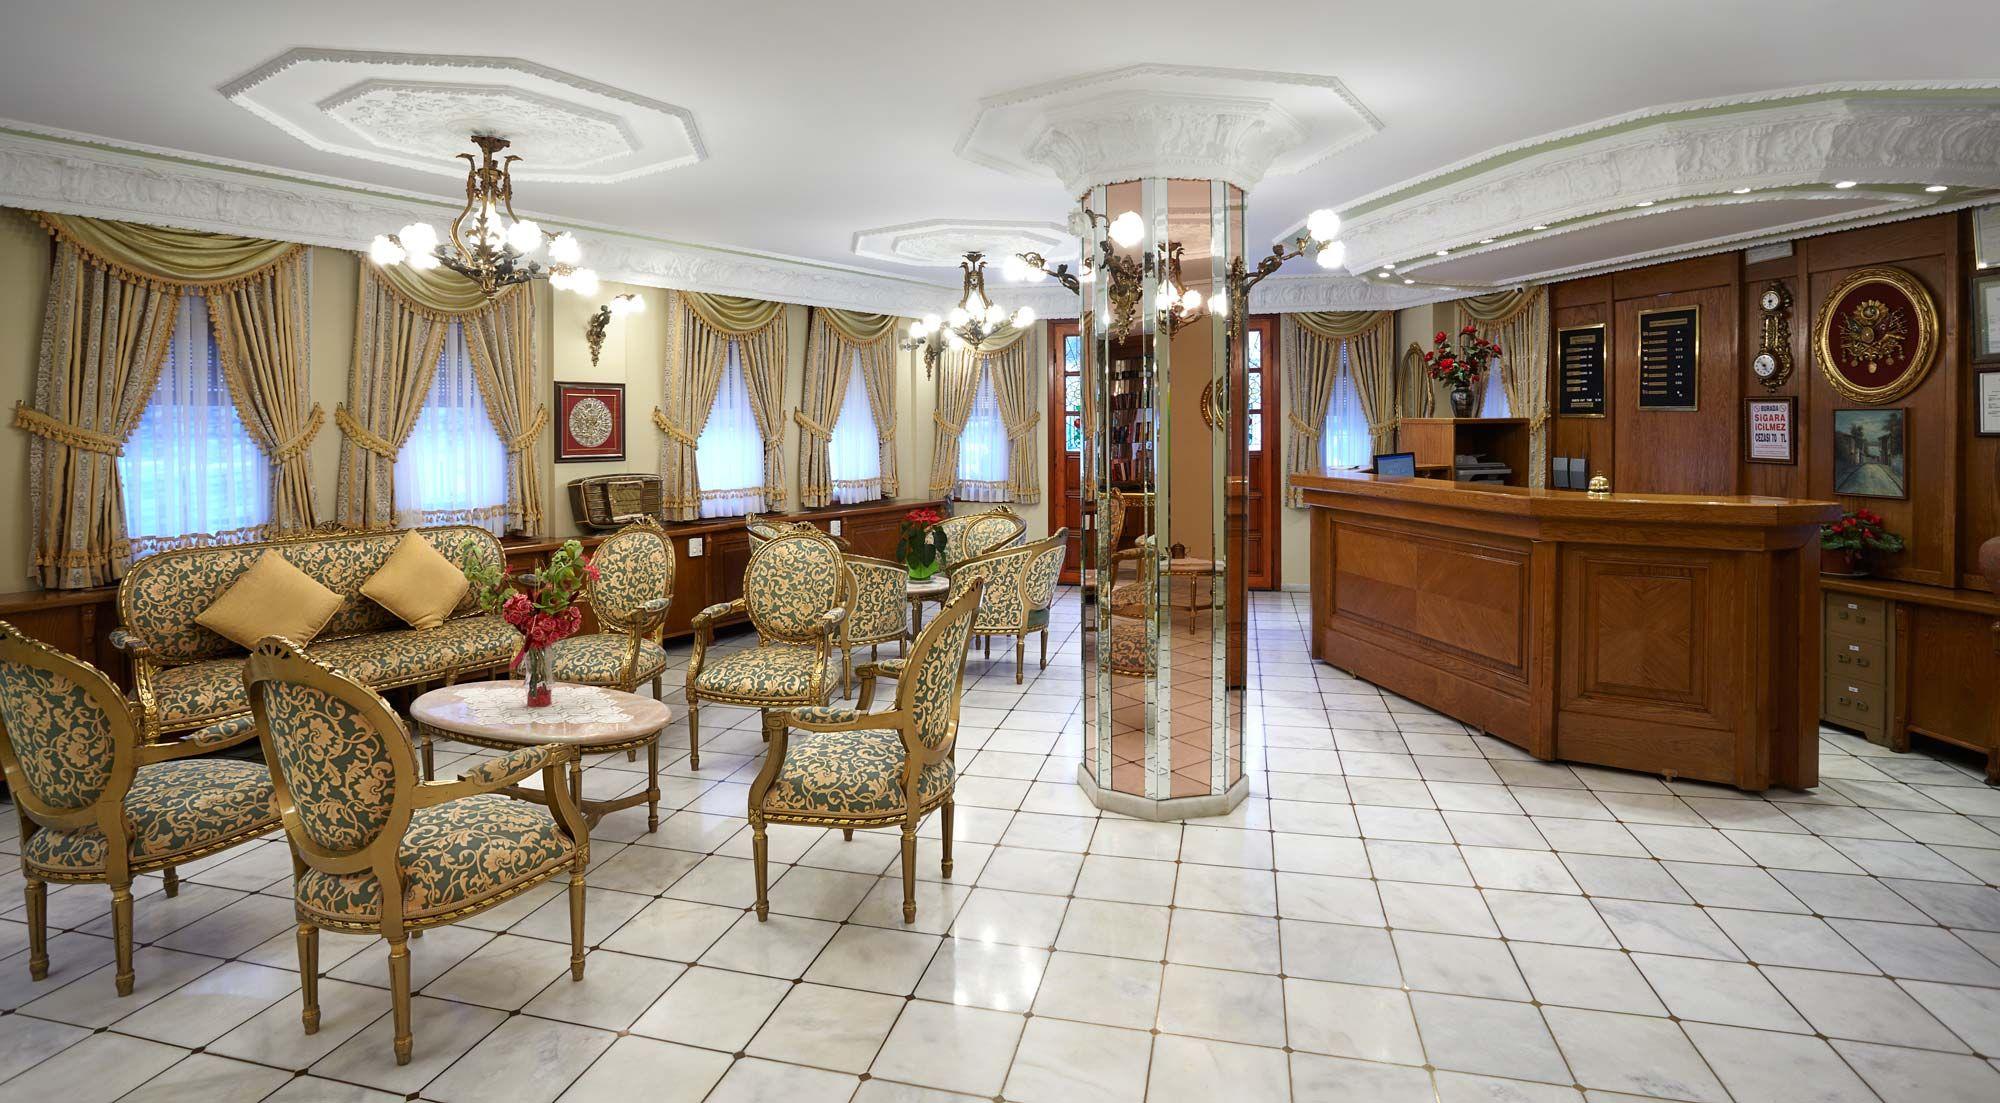 Hotel Valide Sultan site  reviews - http://www.tripadvisor.com/Hotel_Review-g293974-d295488-Reviews-Hotel_Valide_Sultan_Konagi-Istanbul.html